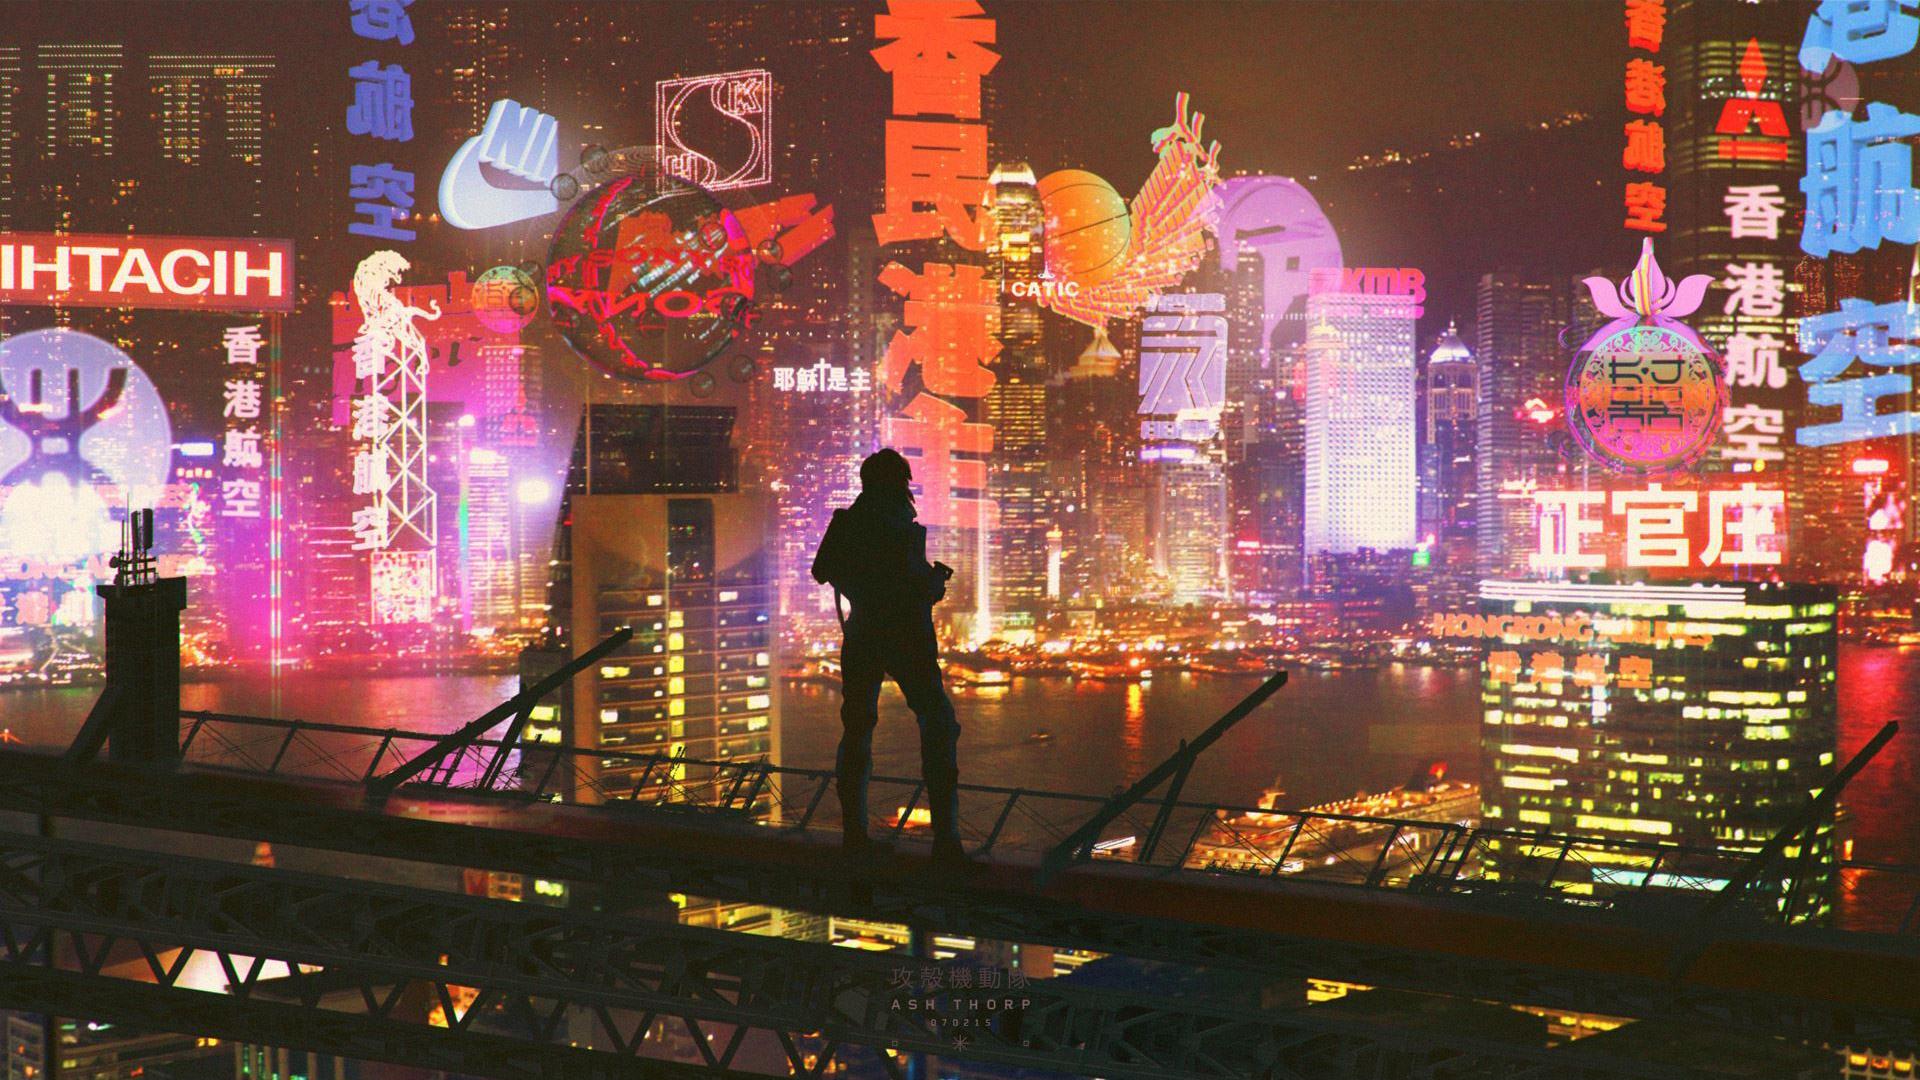 Wallpaper Ghost In The Shell Cityscape Cyberpunk 1920x1080 Chrishun88 1453193 Hd Wallpapers Wallhere